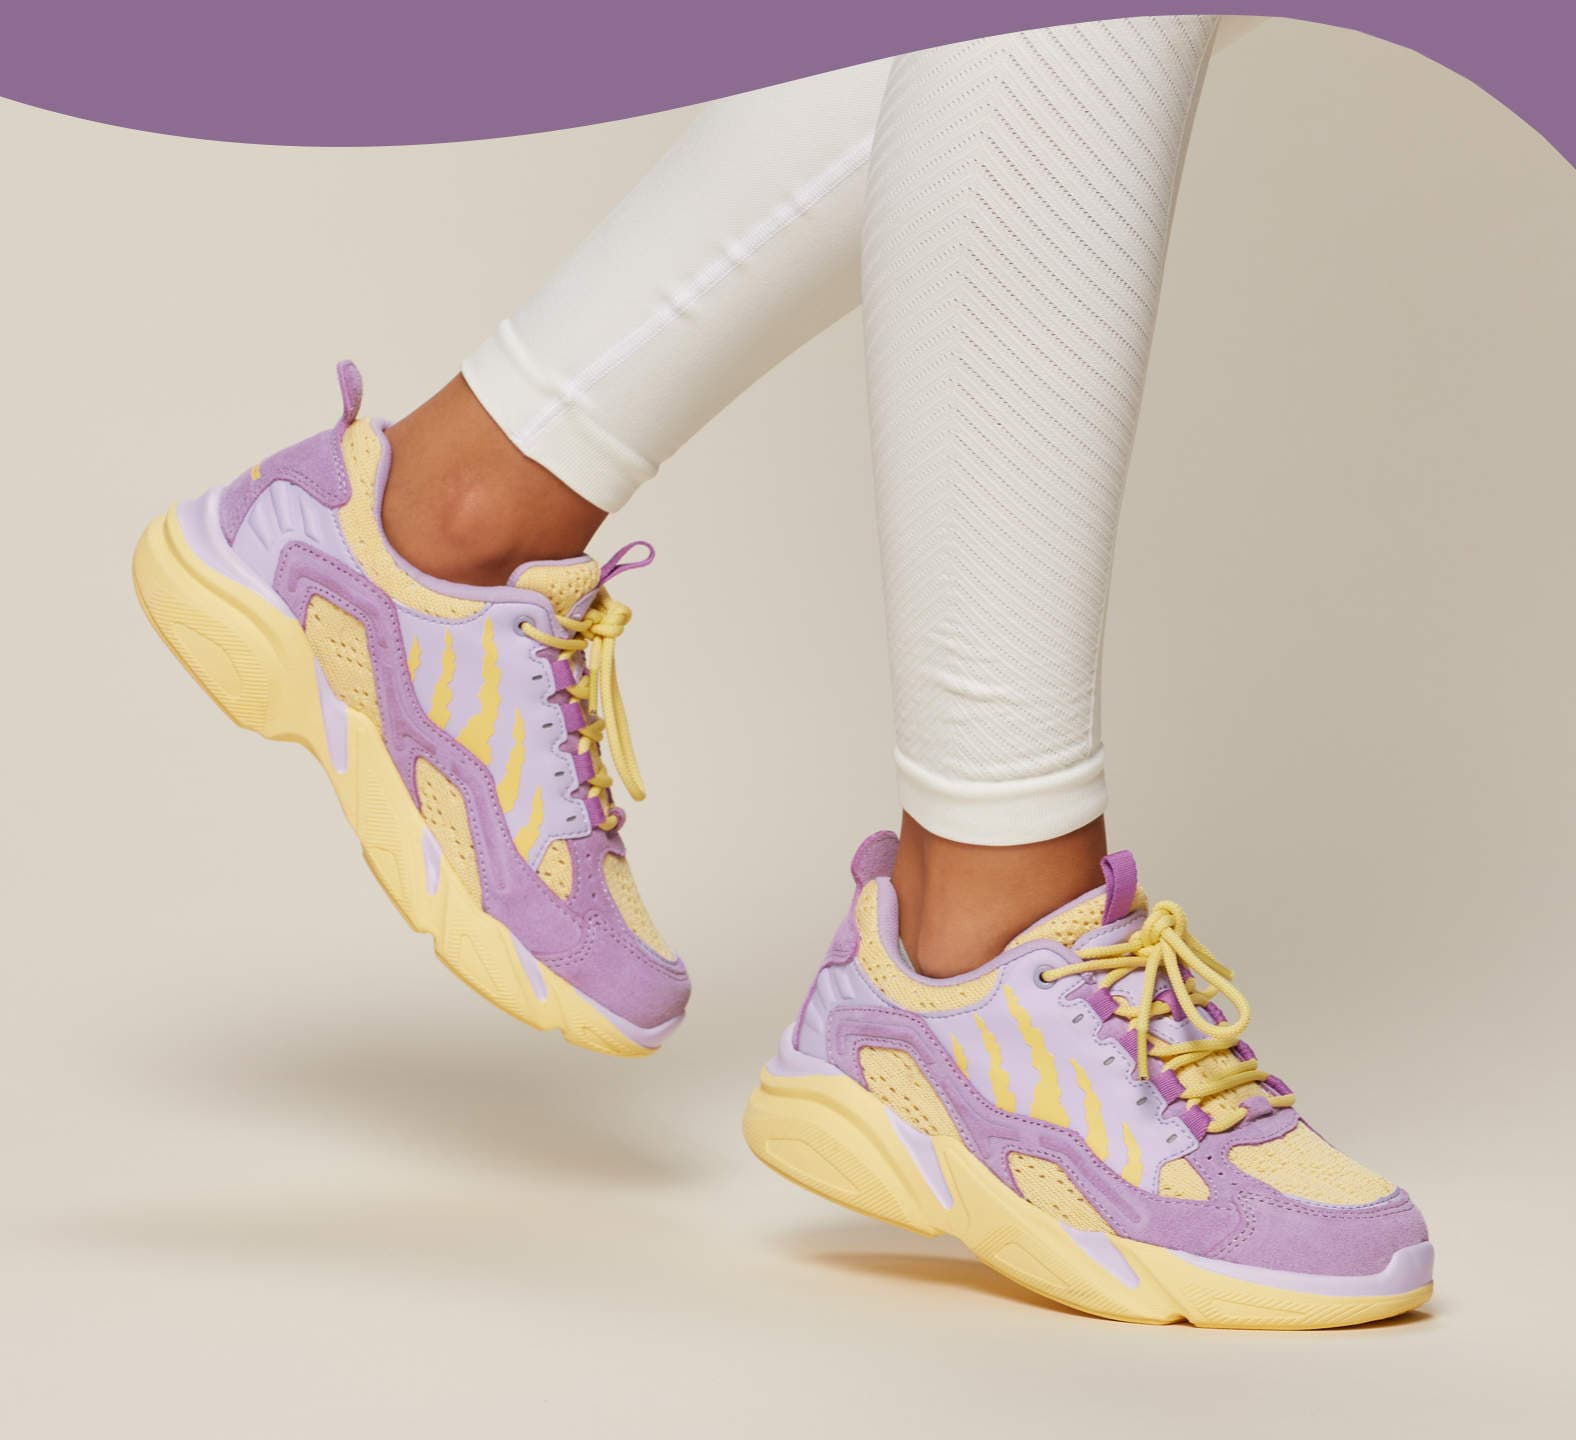 Crush Alpine Sneakers - Lavender Purple